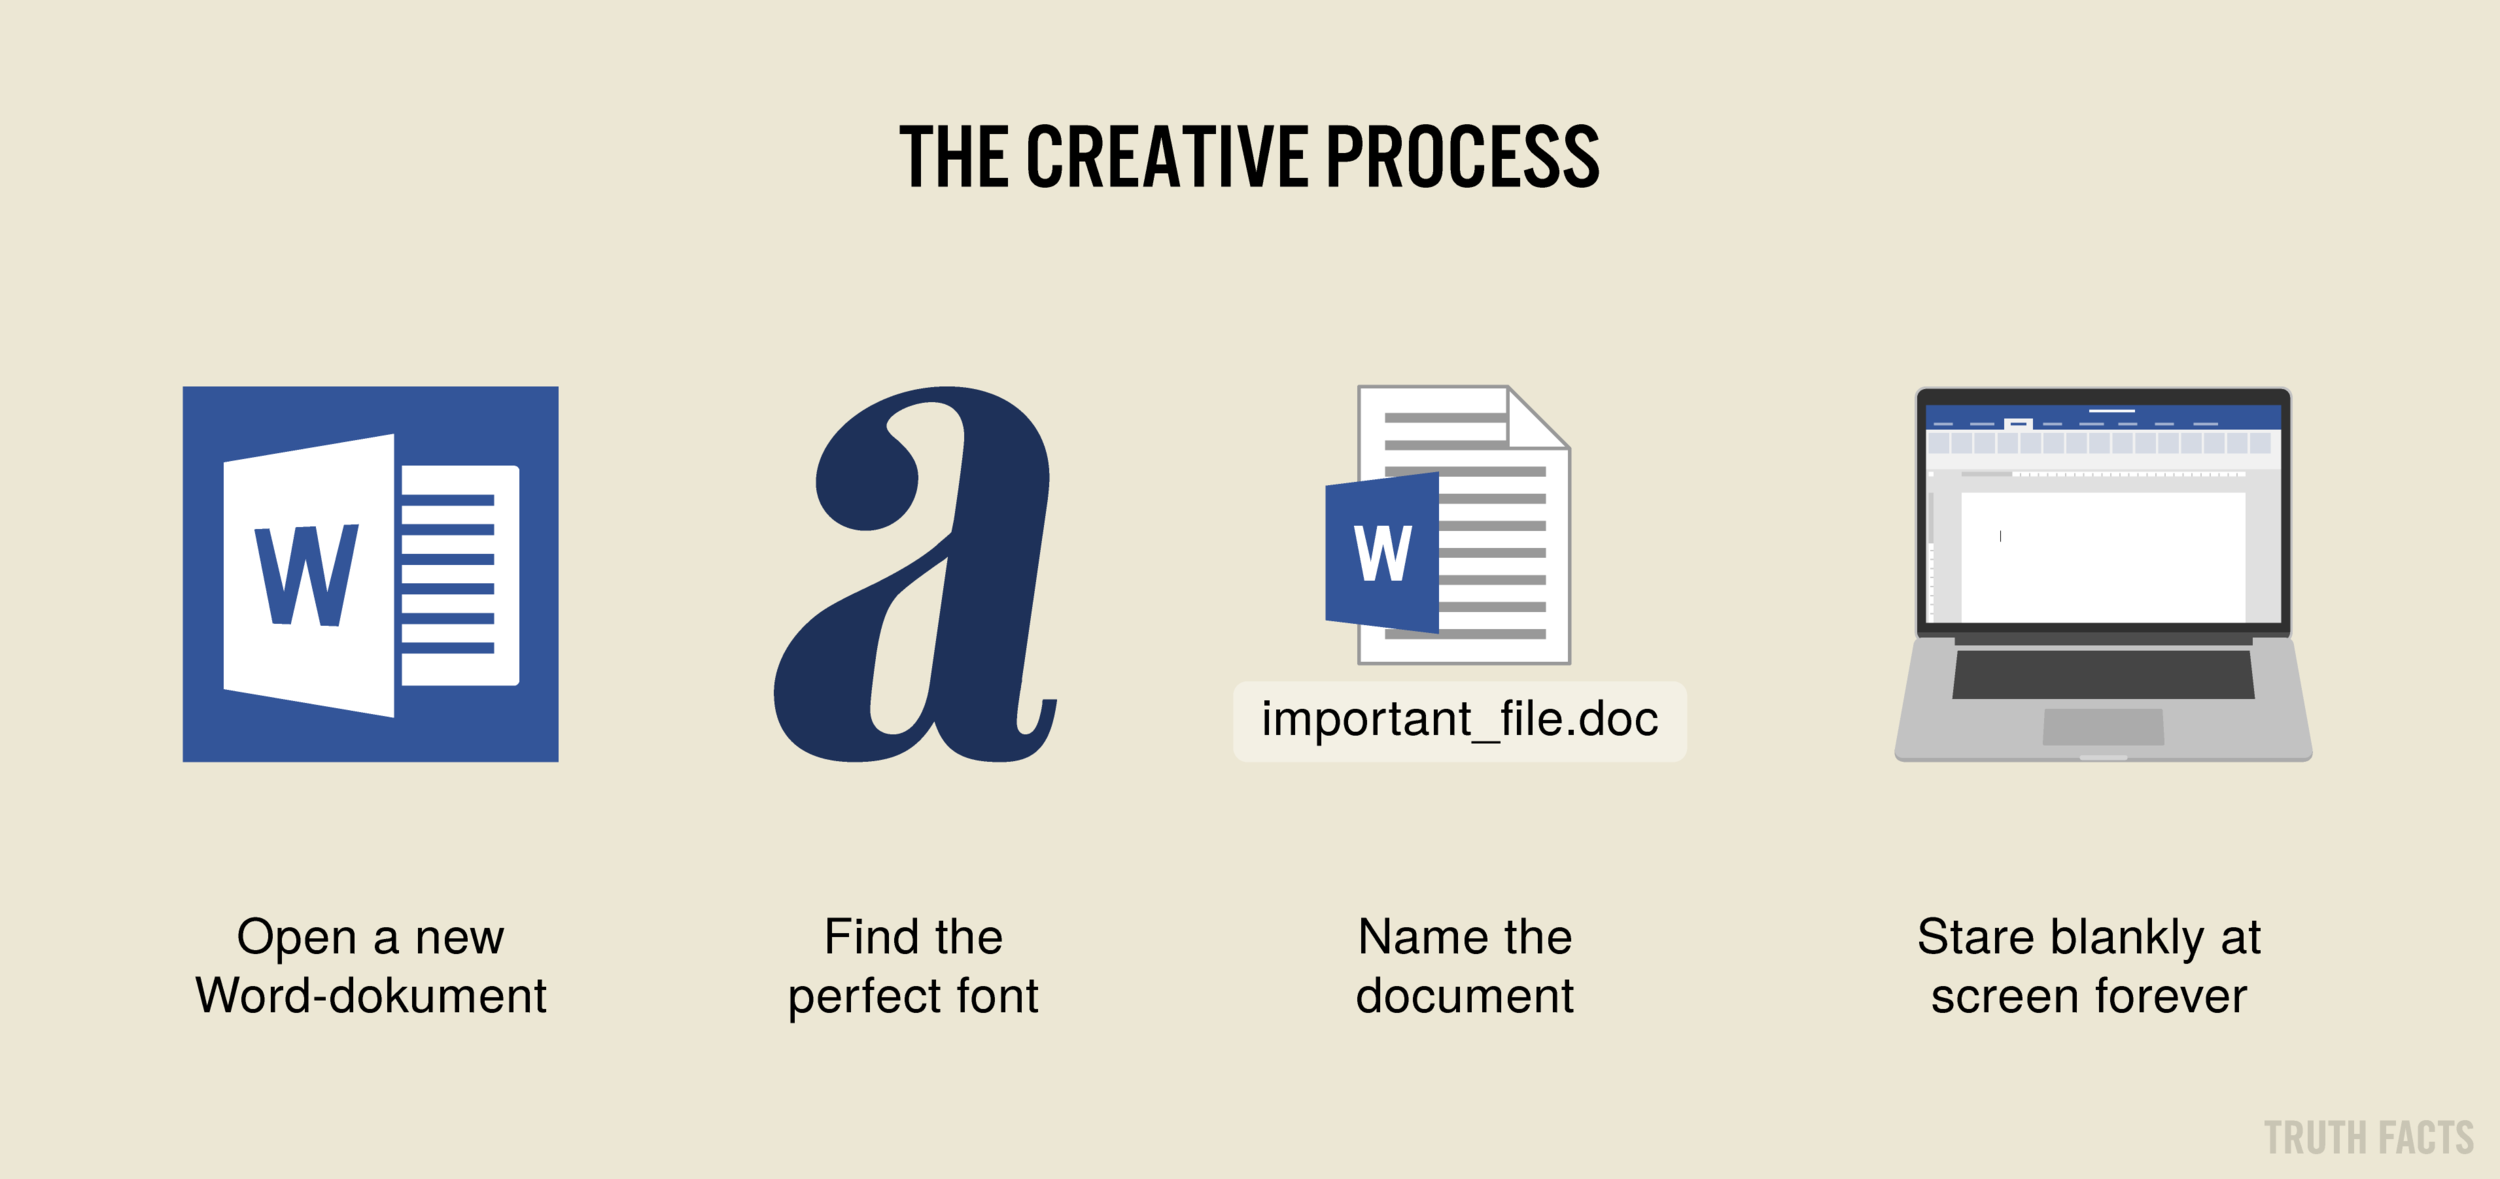 1673 US Den kreative proces.png